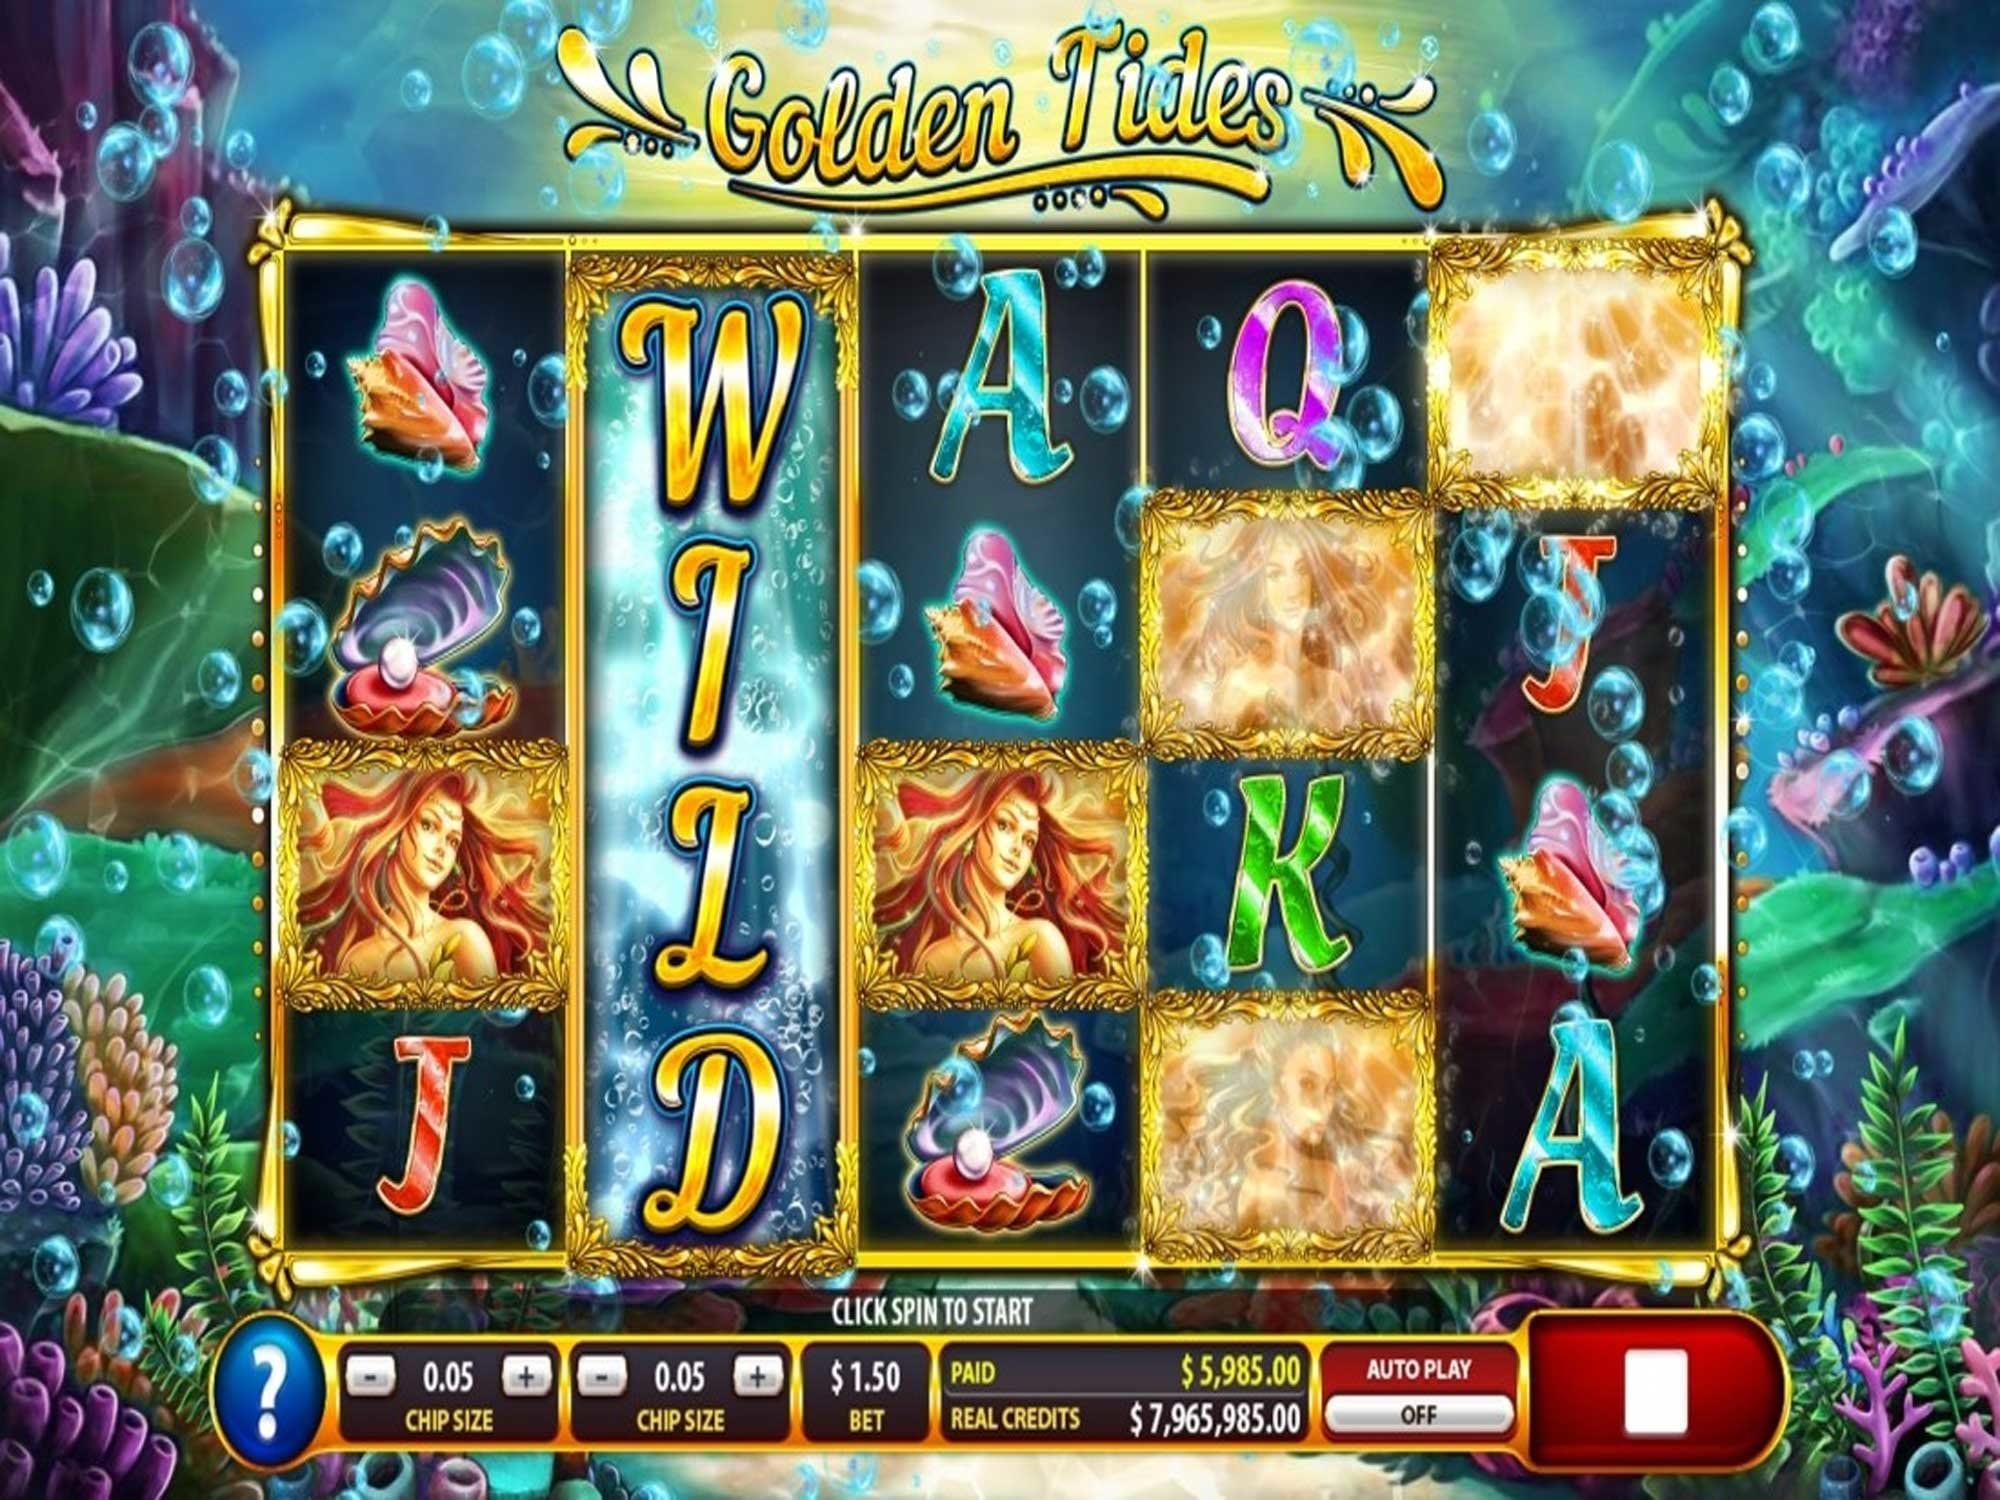 Golden Tides Gameplay Casino